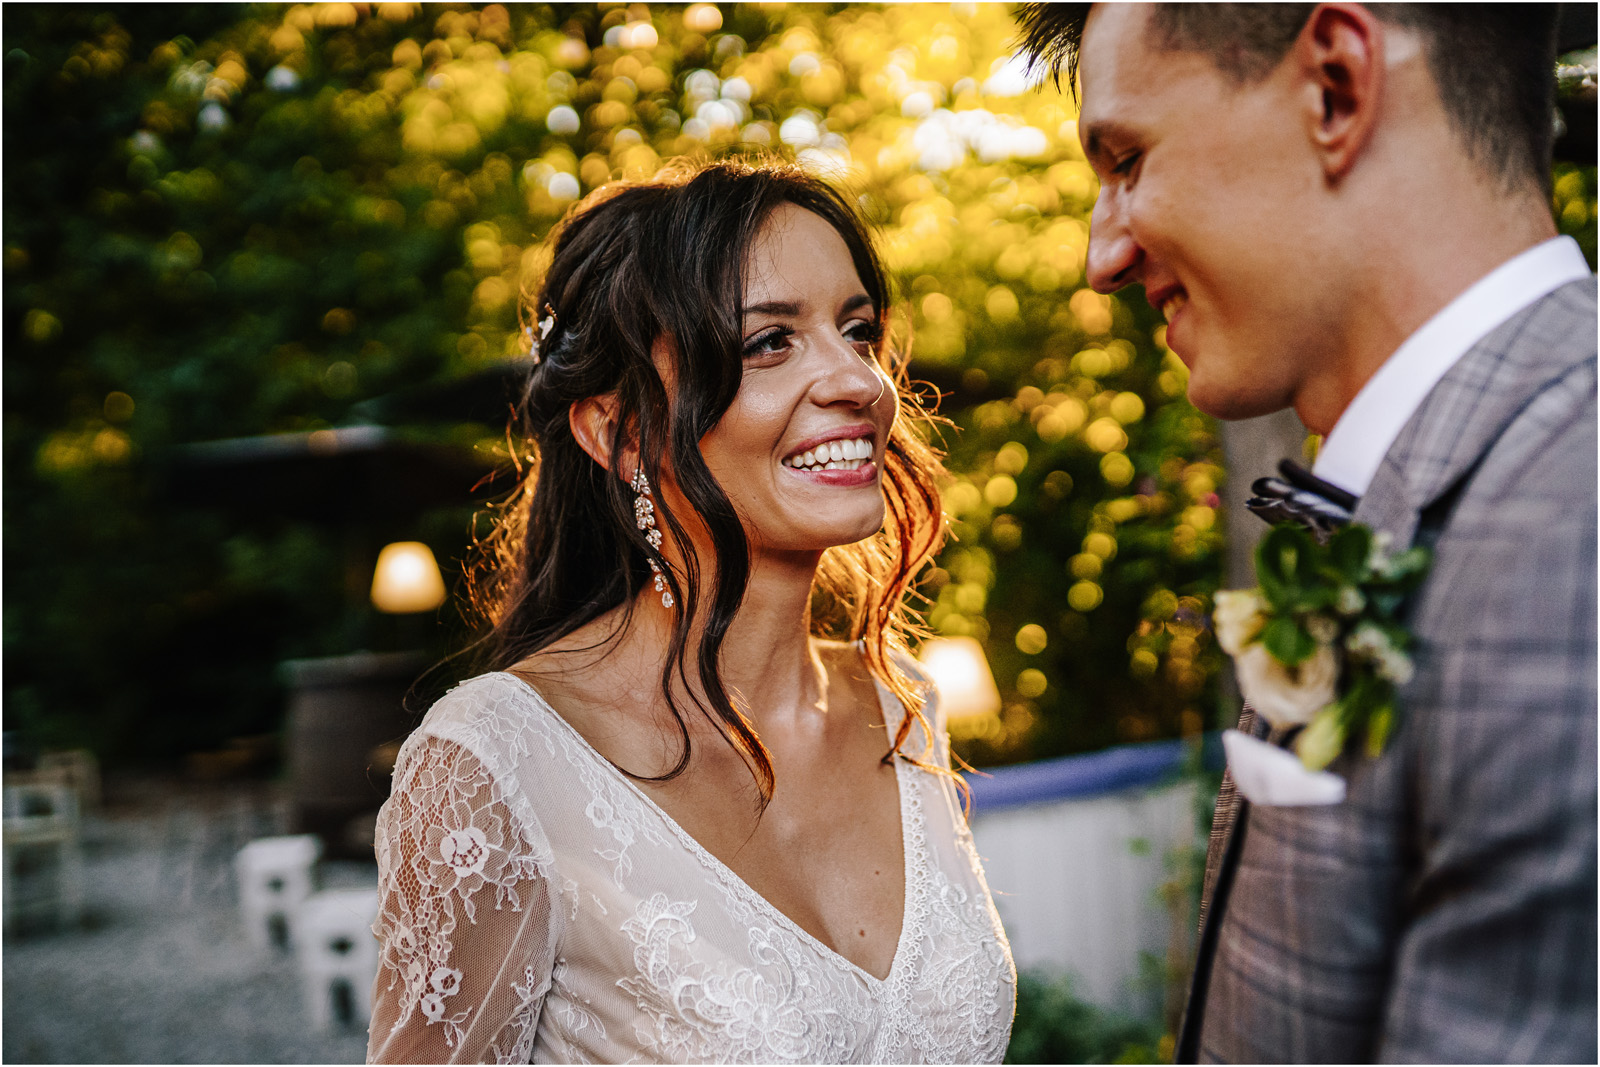 Ania & Mateusz | boho wesele w Stodole pod Kasztanami 89